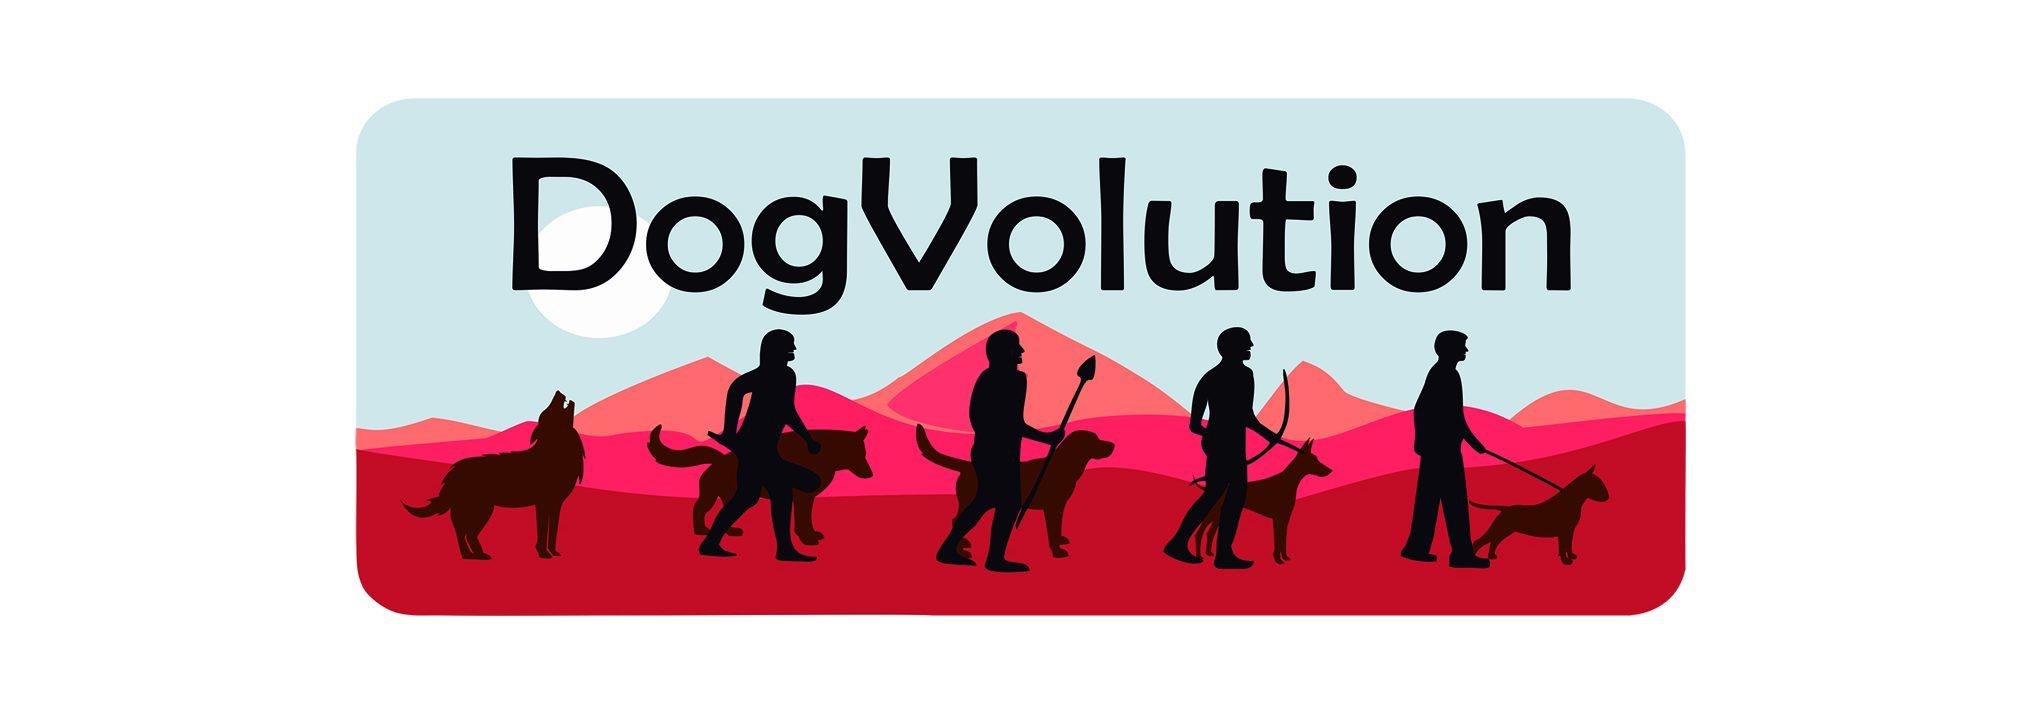 Dogvolution